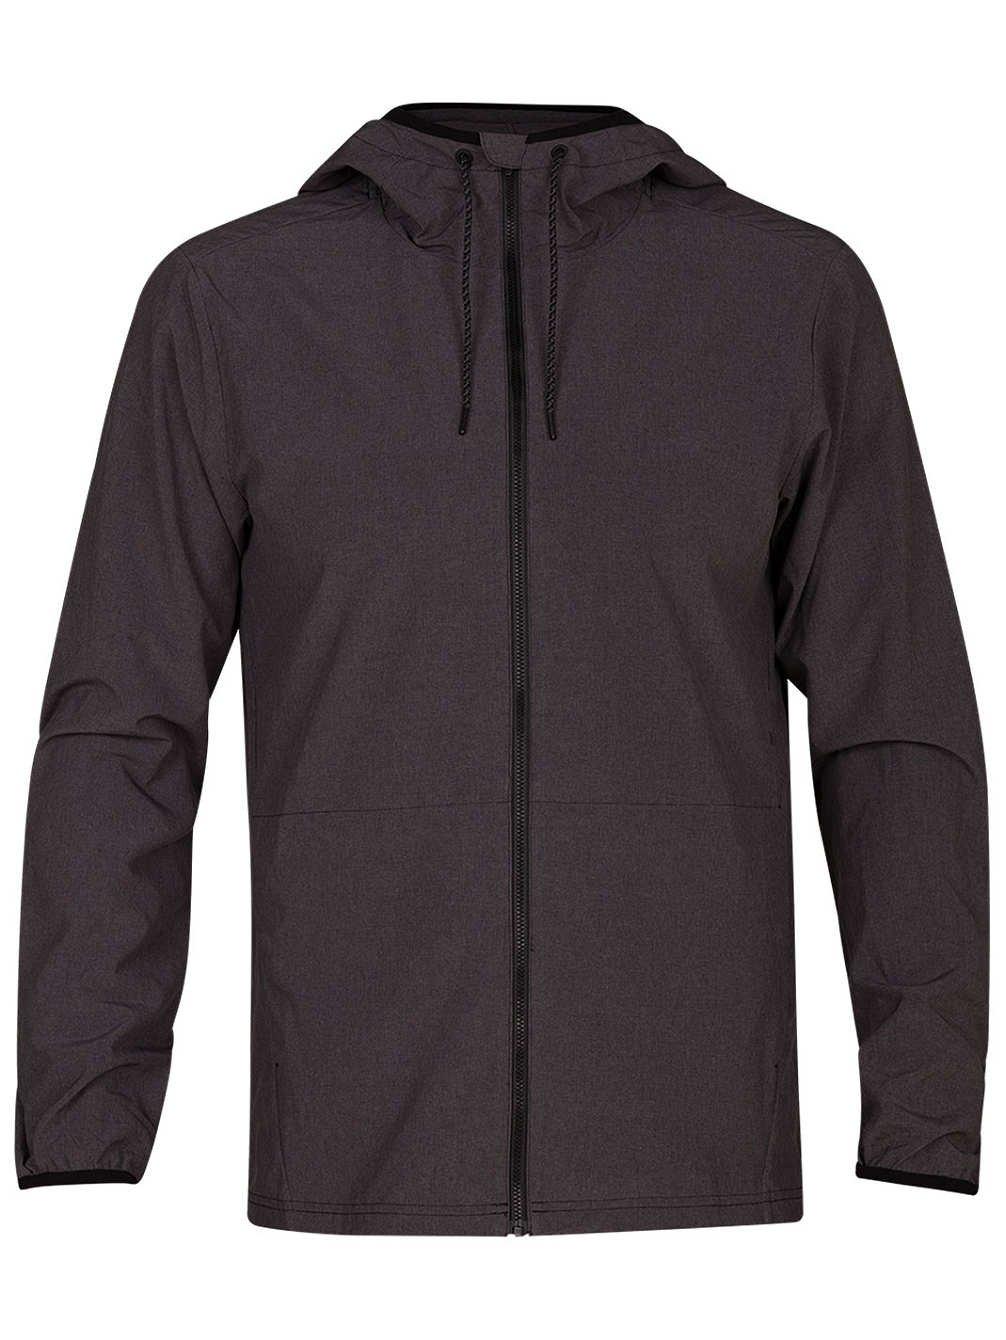 Hurley Protect Stretch 20 Jacket Large Black